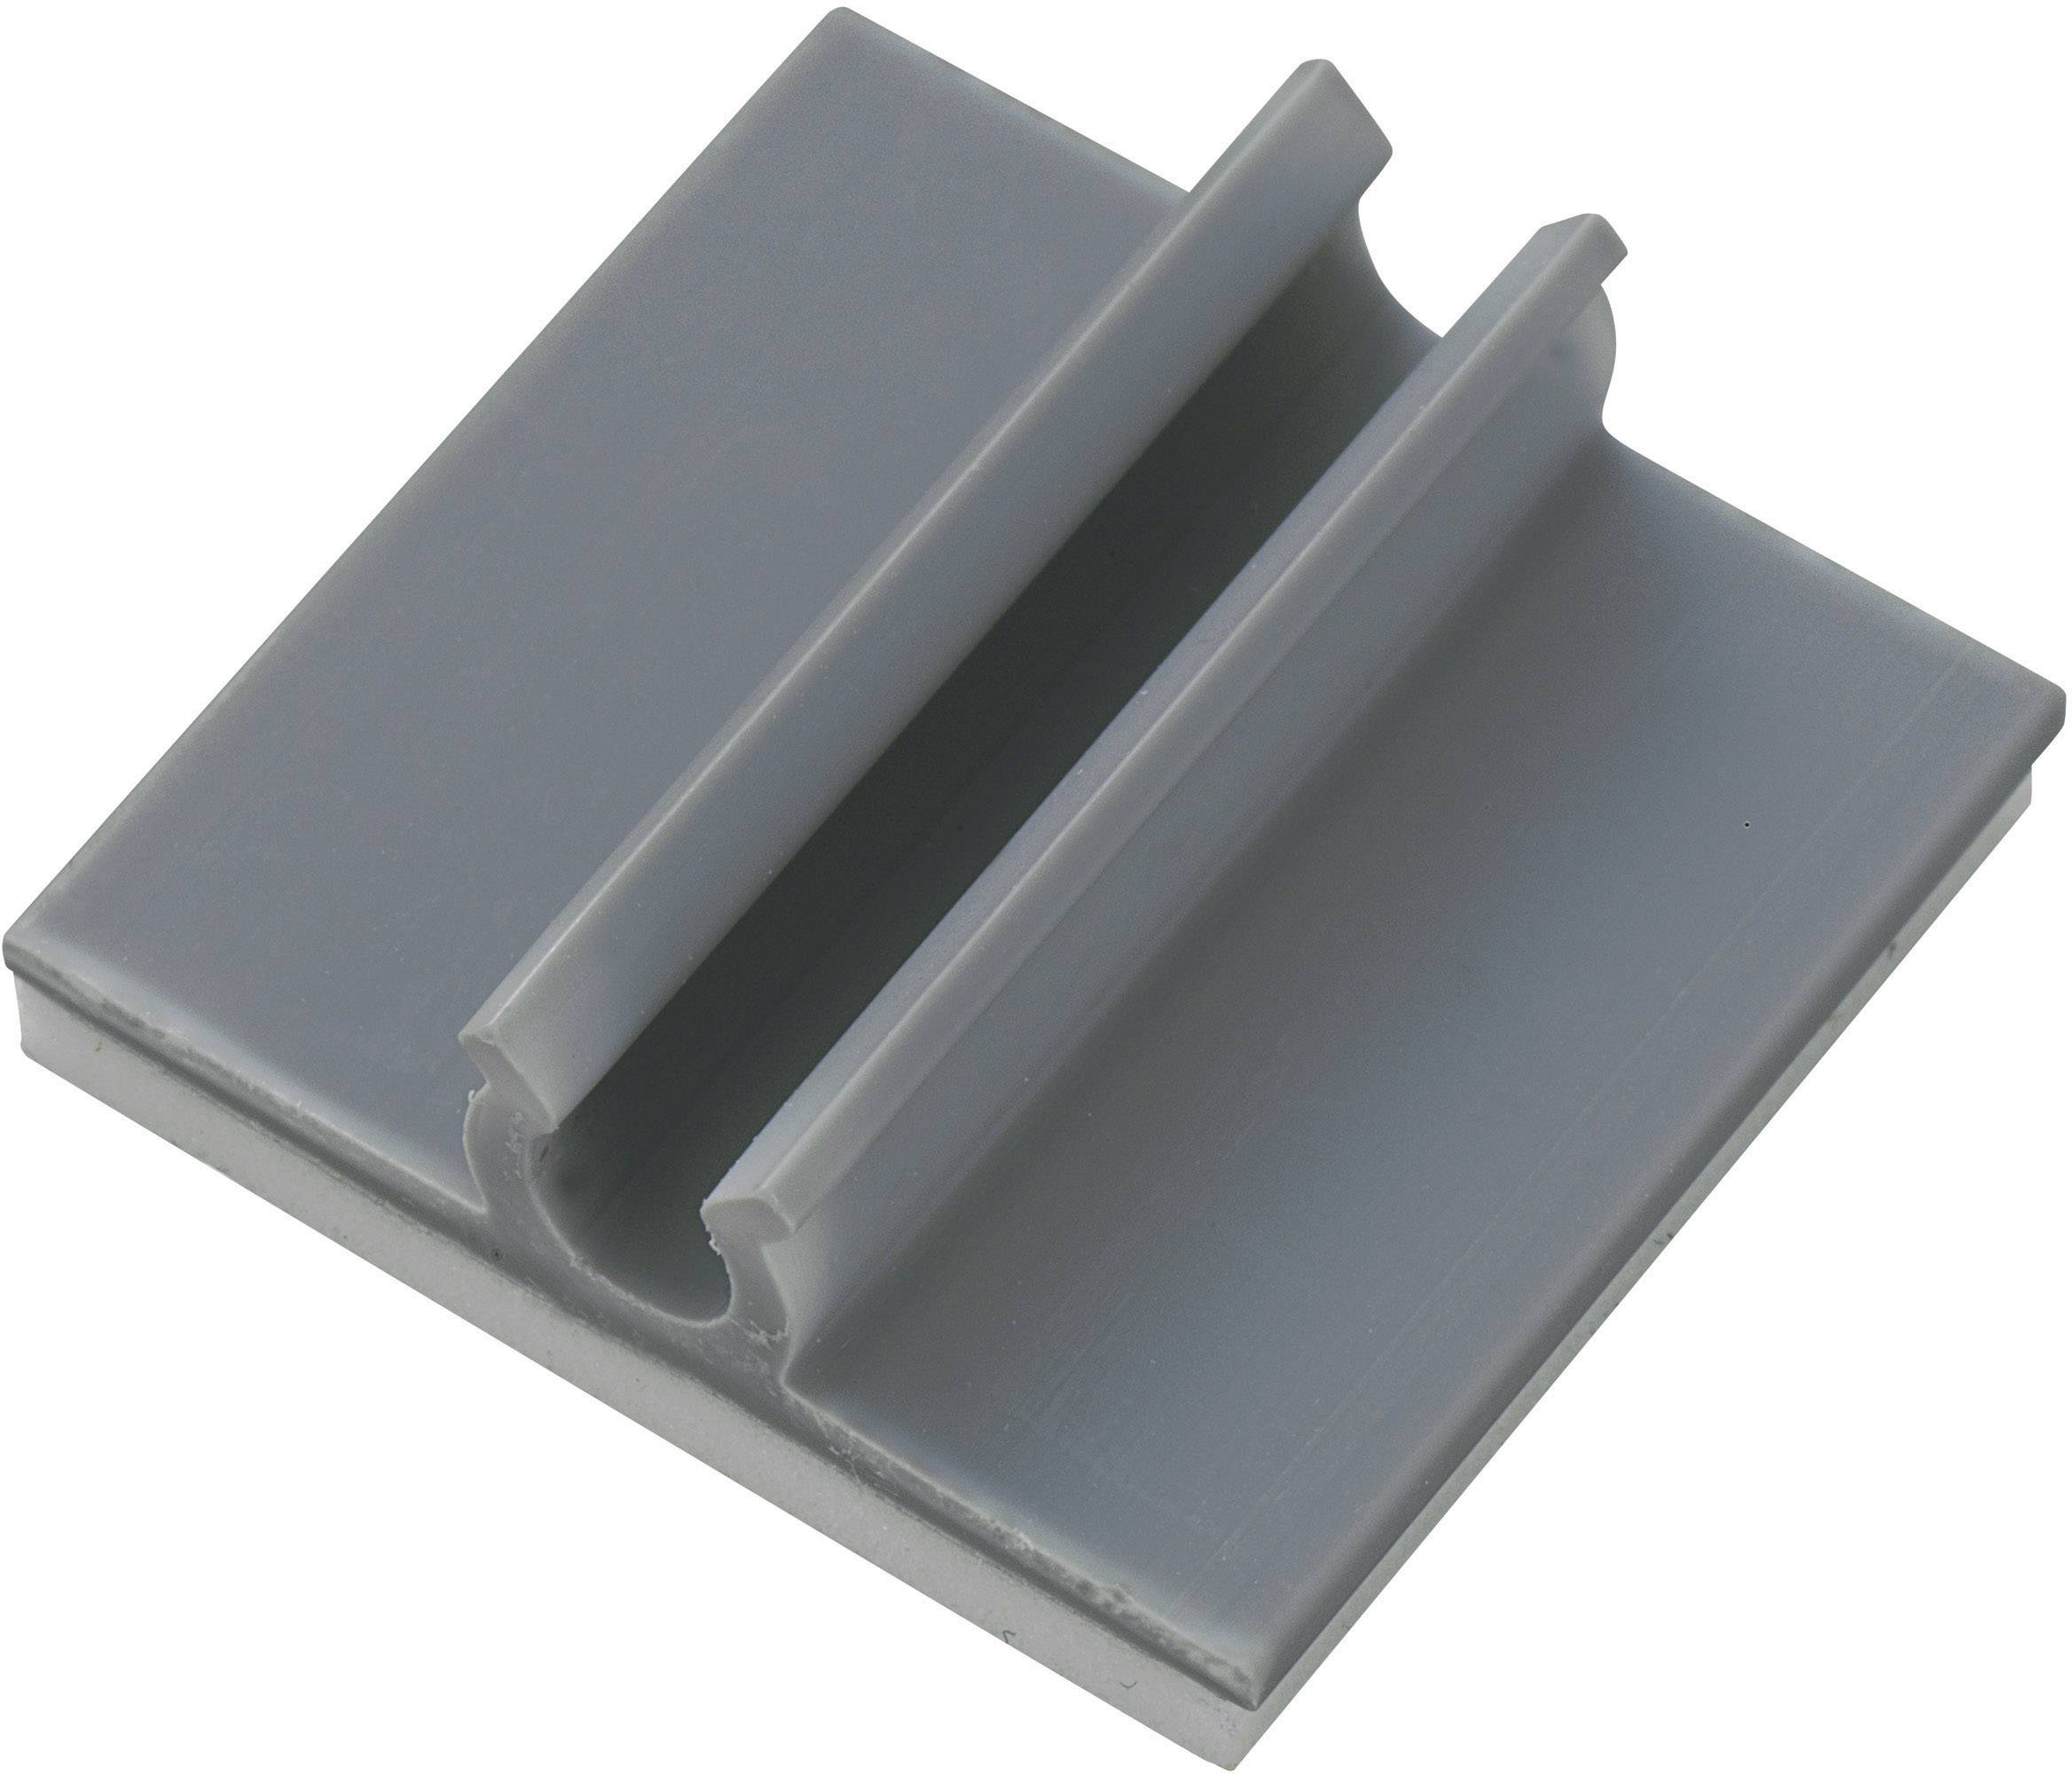 Úchytka Conrad Components 543342, samolepiaci, 6.40 mm (max), sivá, 1 ks